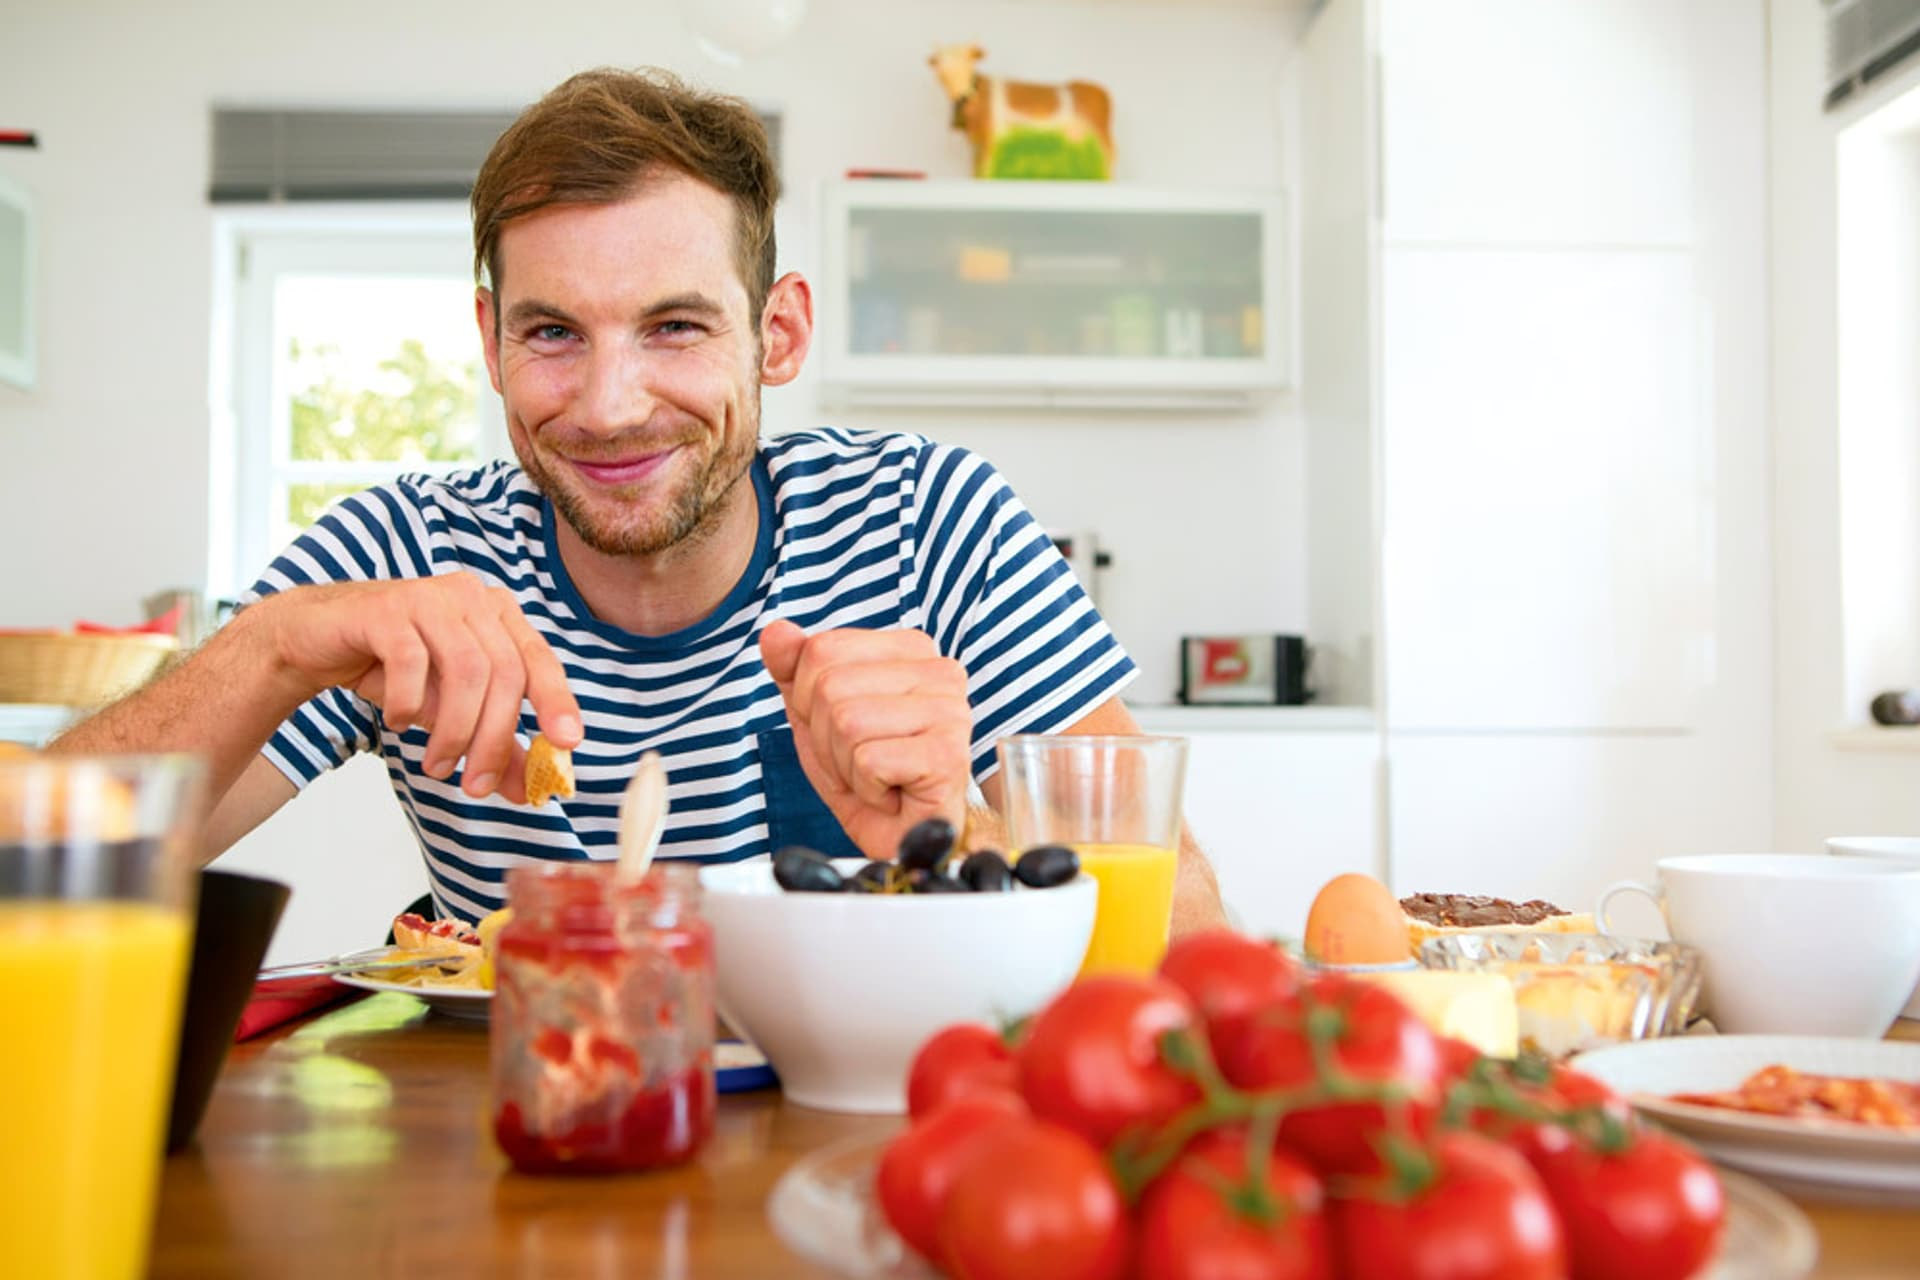 Mann frühstückt nach der veganen Pyramide